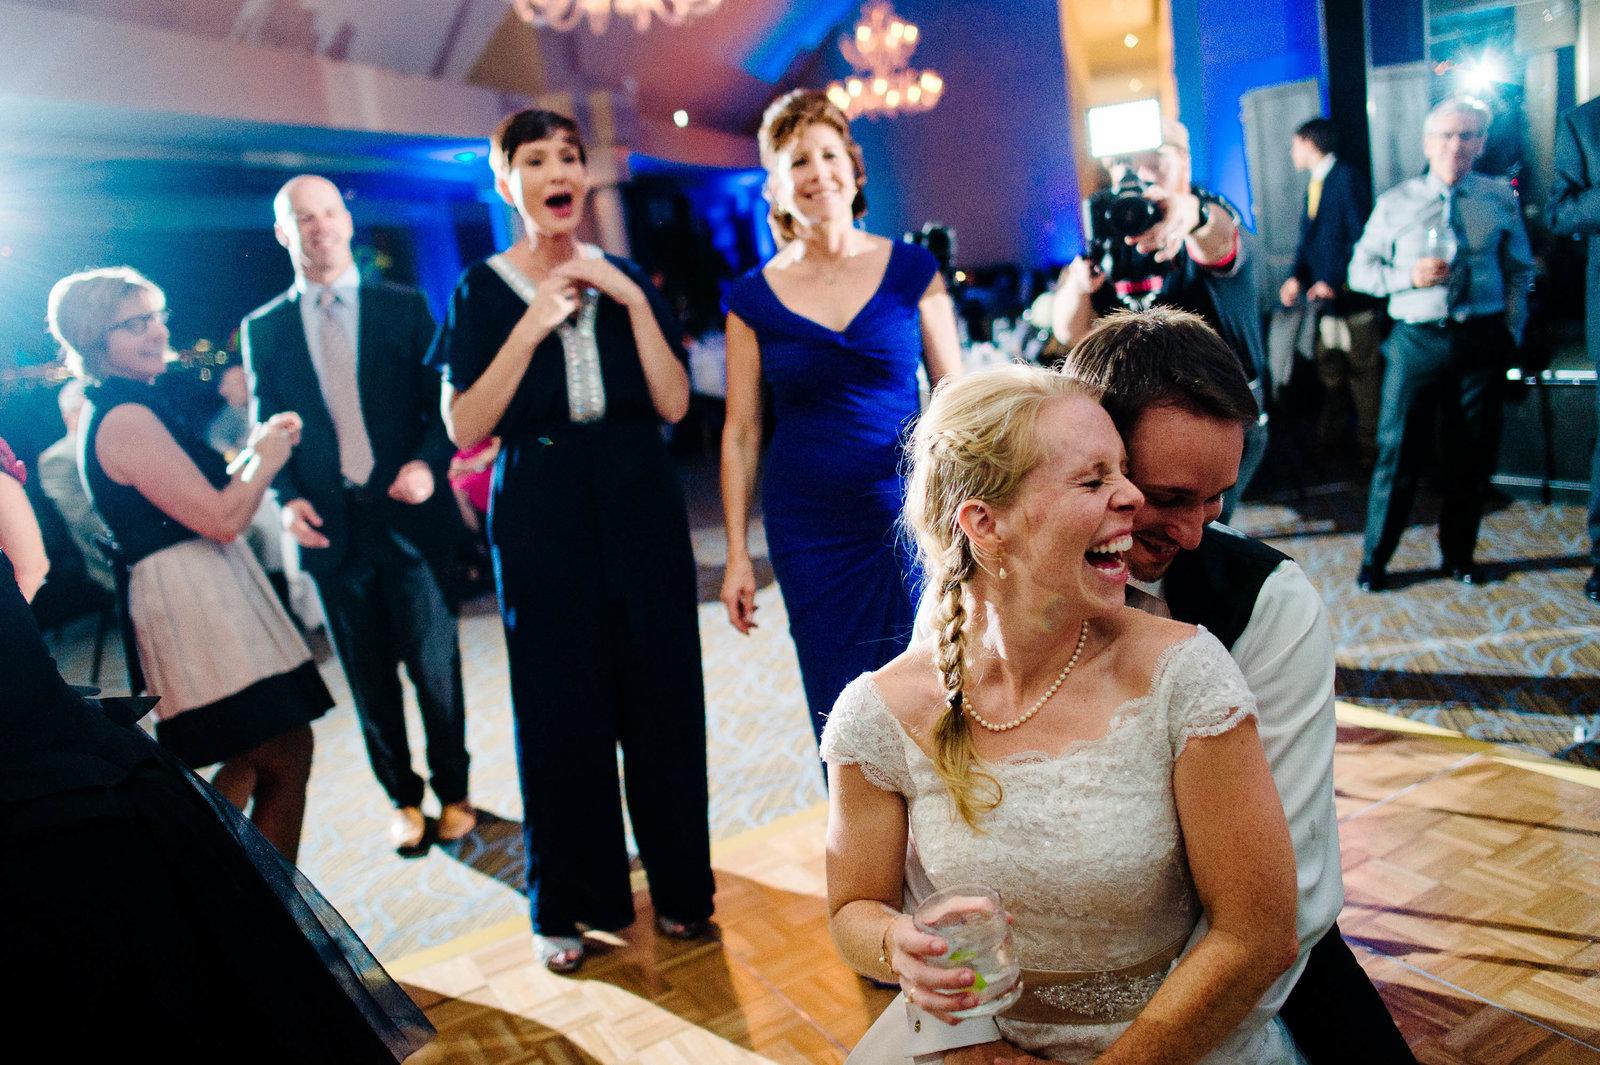 149-El-paso-wedding-photographer-El Paso Wedding Photographer_M49